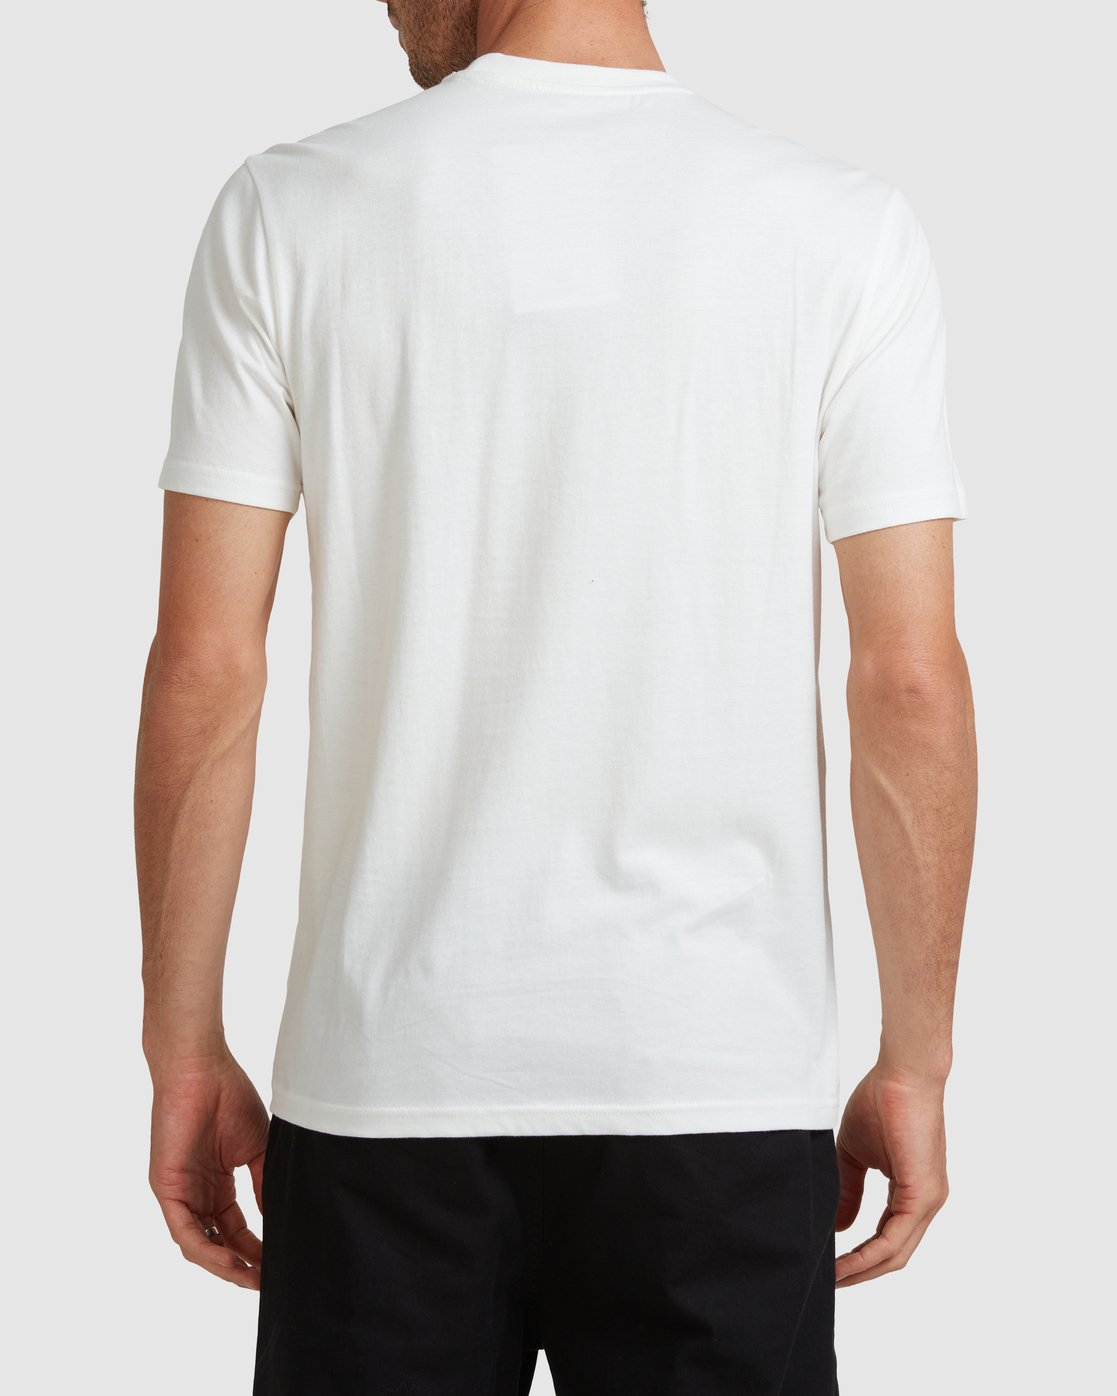 3 PEANUTS SIMPLE LIVING SHORT SLEEVE TEE White G517010 Element